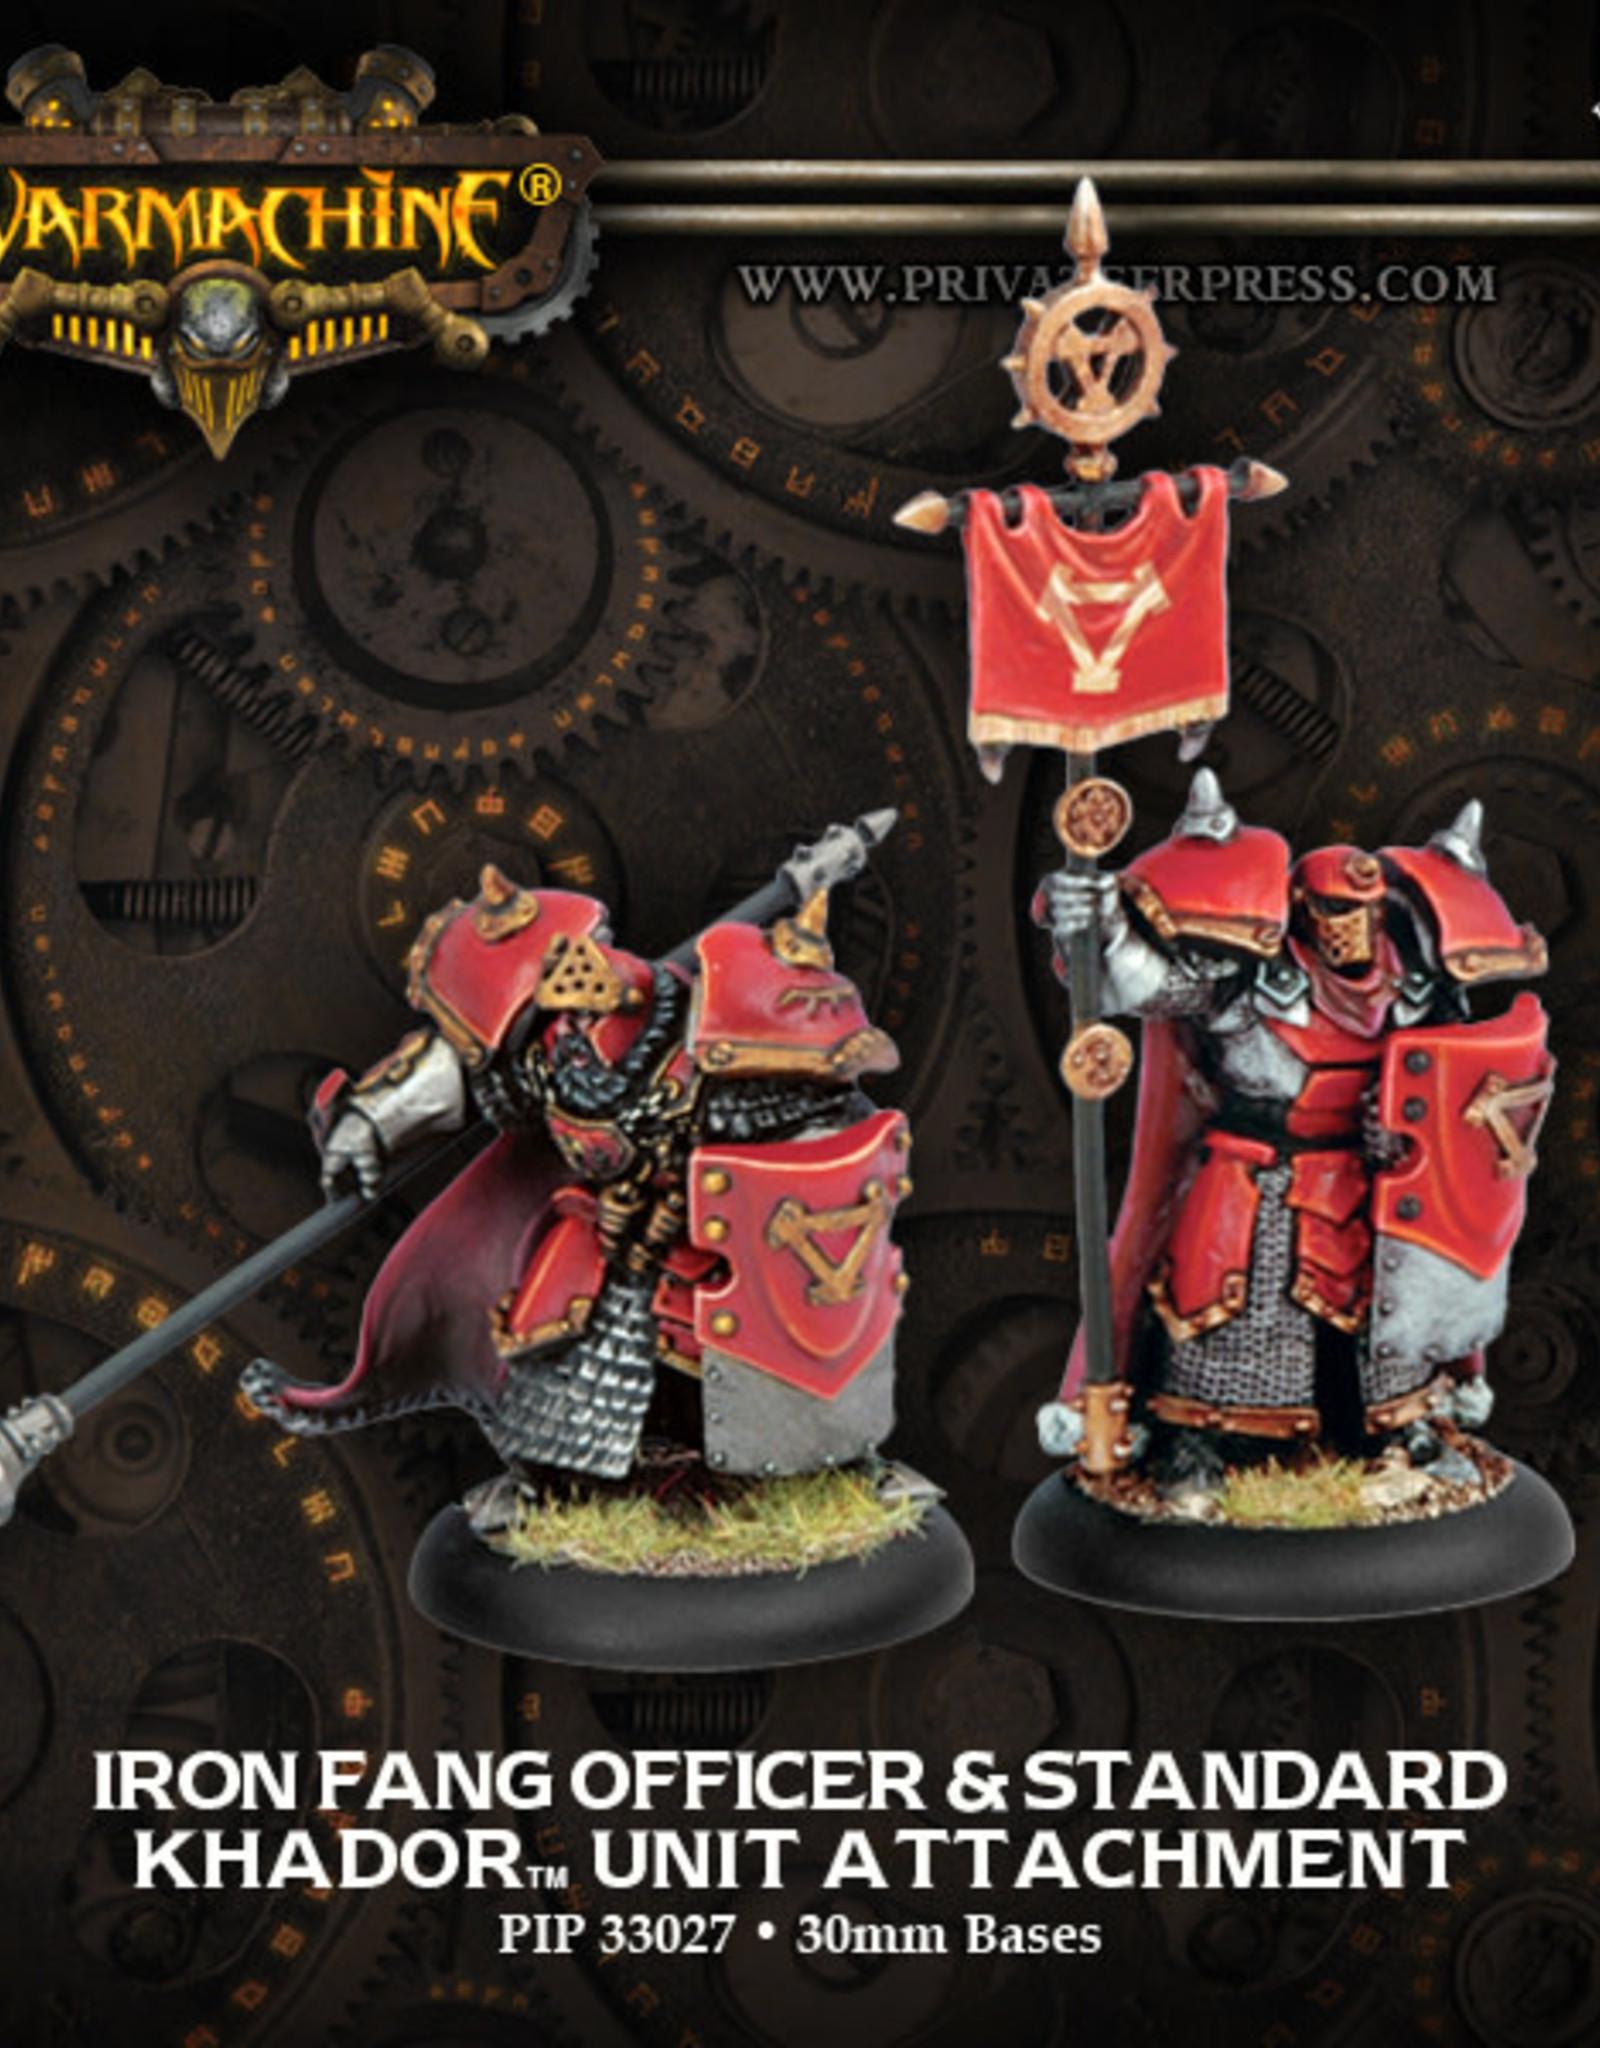 Warmachine Khador - Iron Fang Kapitan